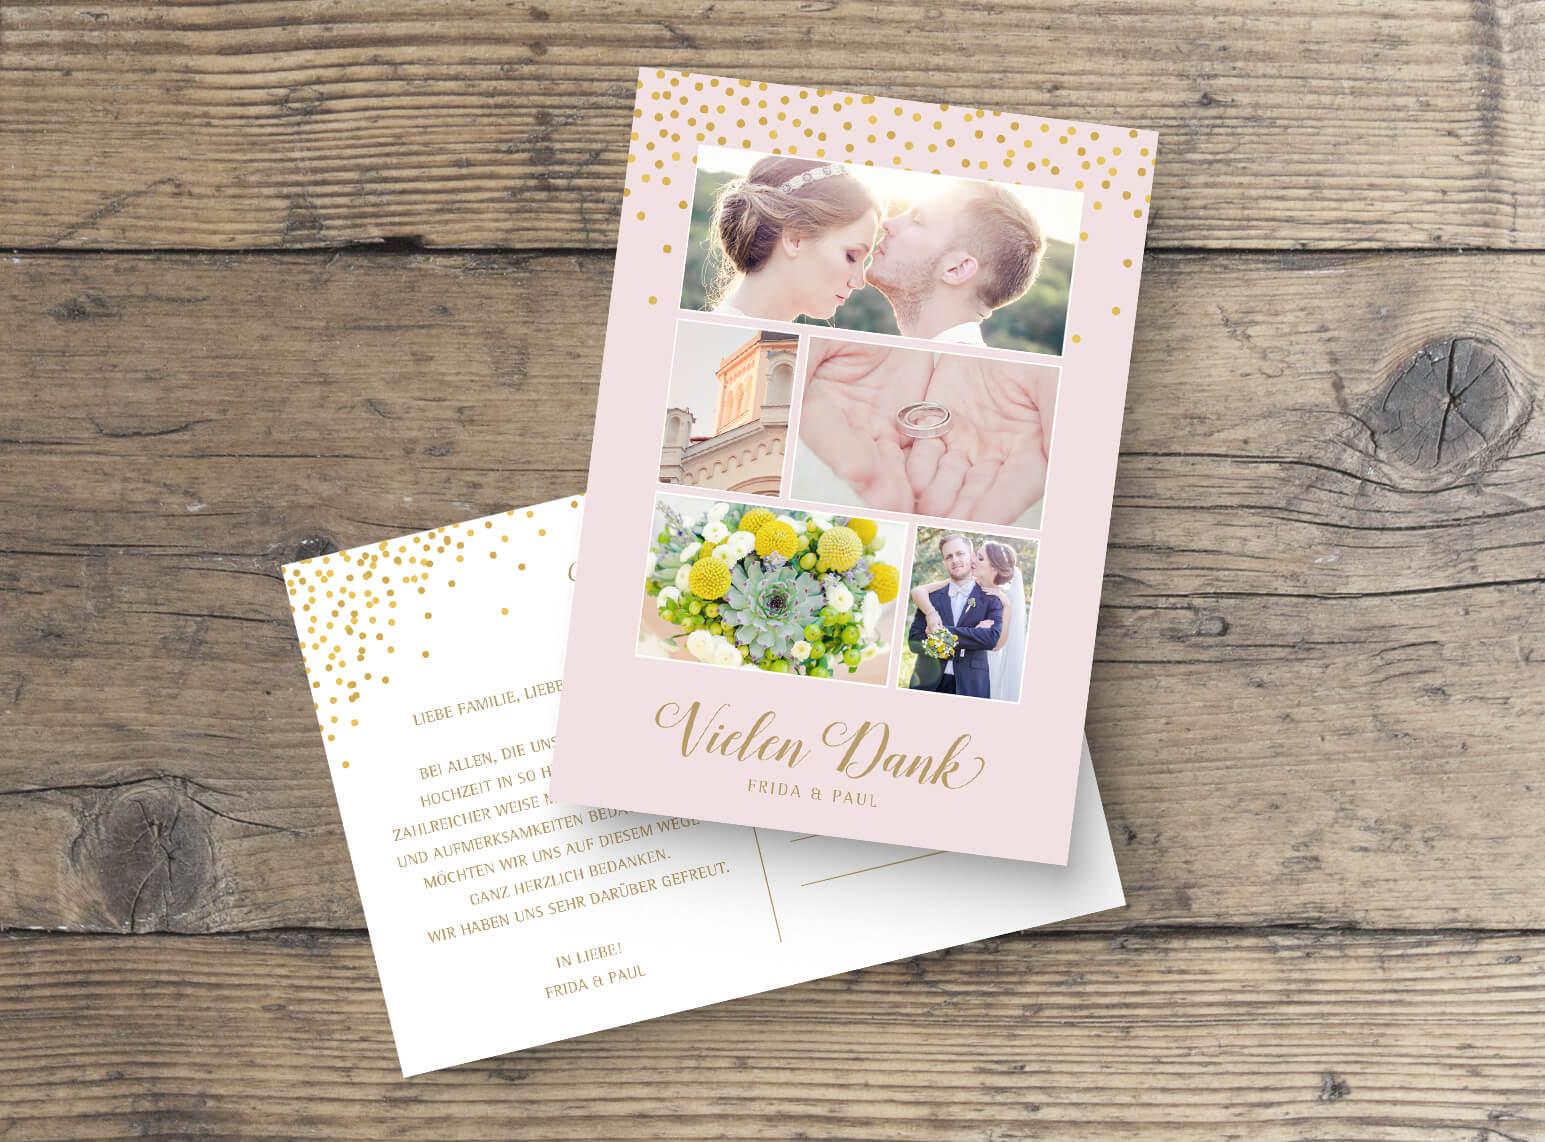 hochzeit-dankeskarte-karte-dina-6-rosa-gold-sparkle_front_MP0023-7.1_kl